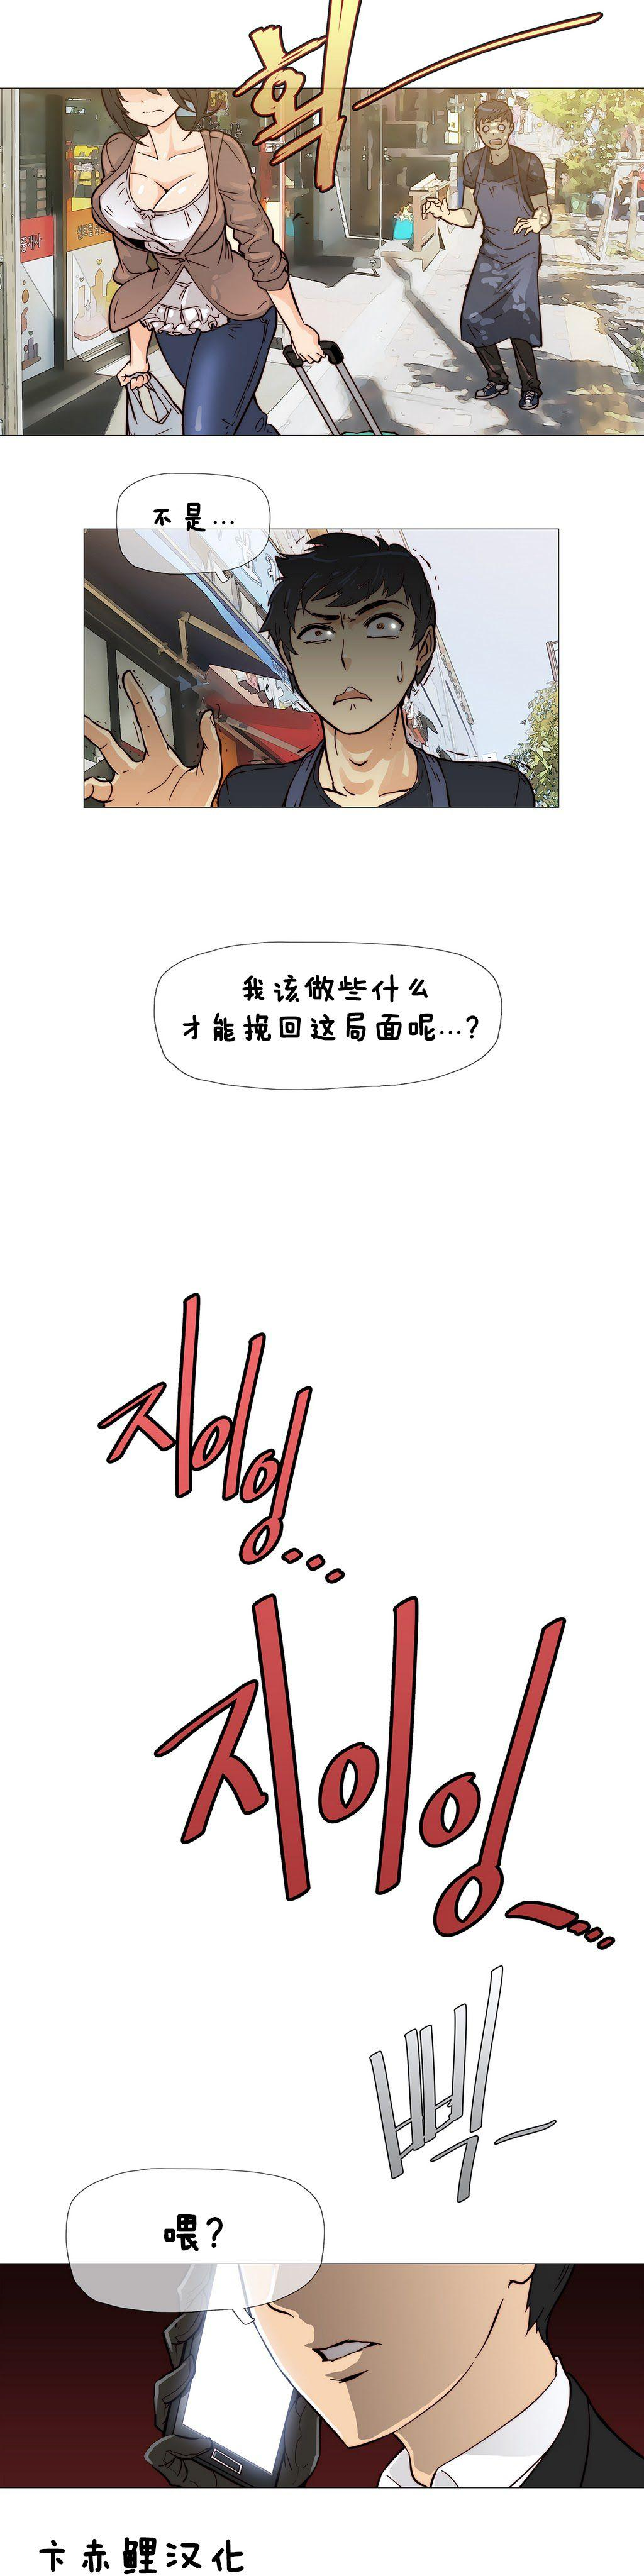 HouseHold Affairs 【卞赤鲤个人汉化】1~21话(持续更新中) 80